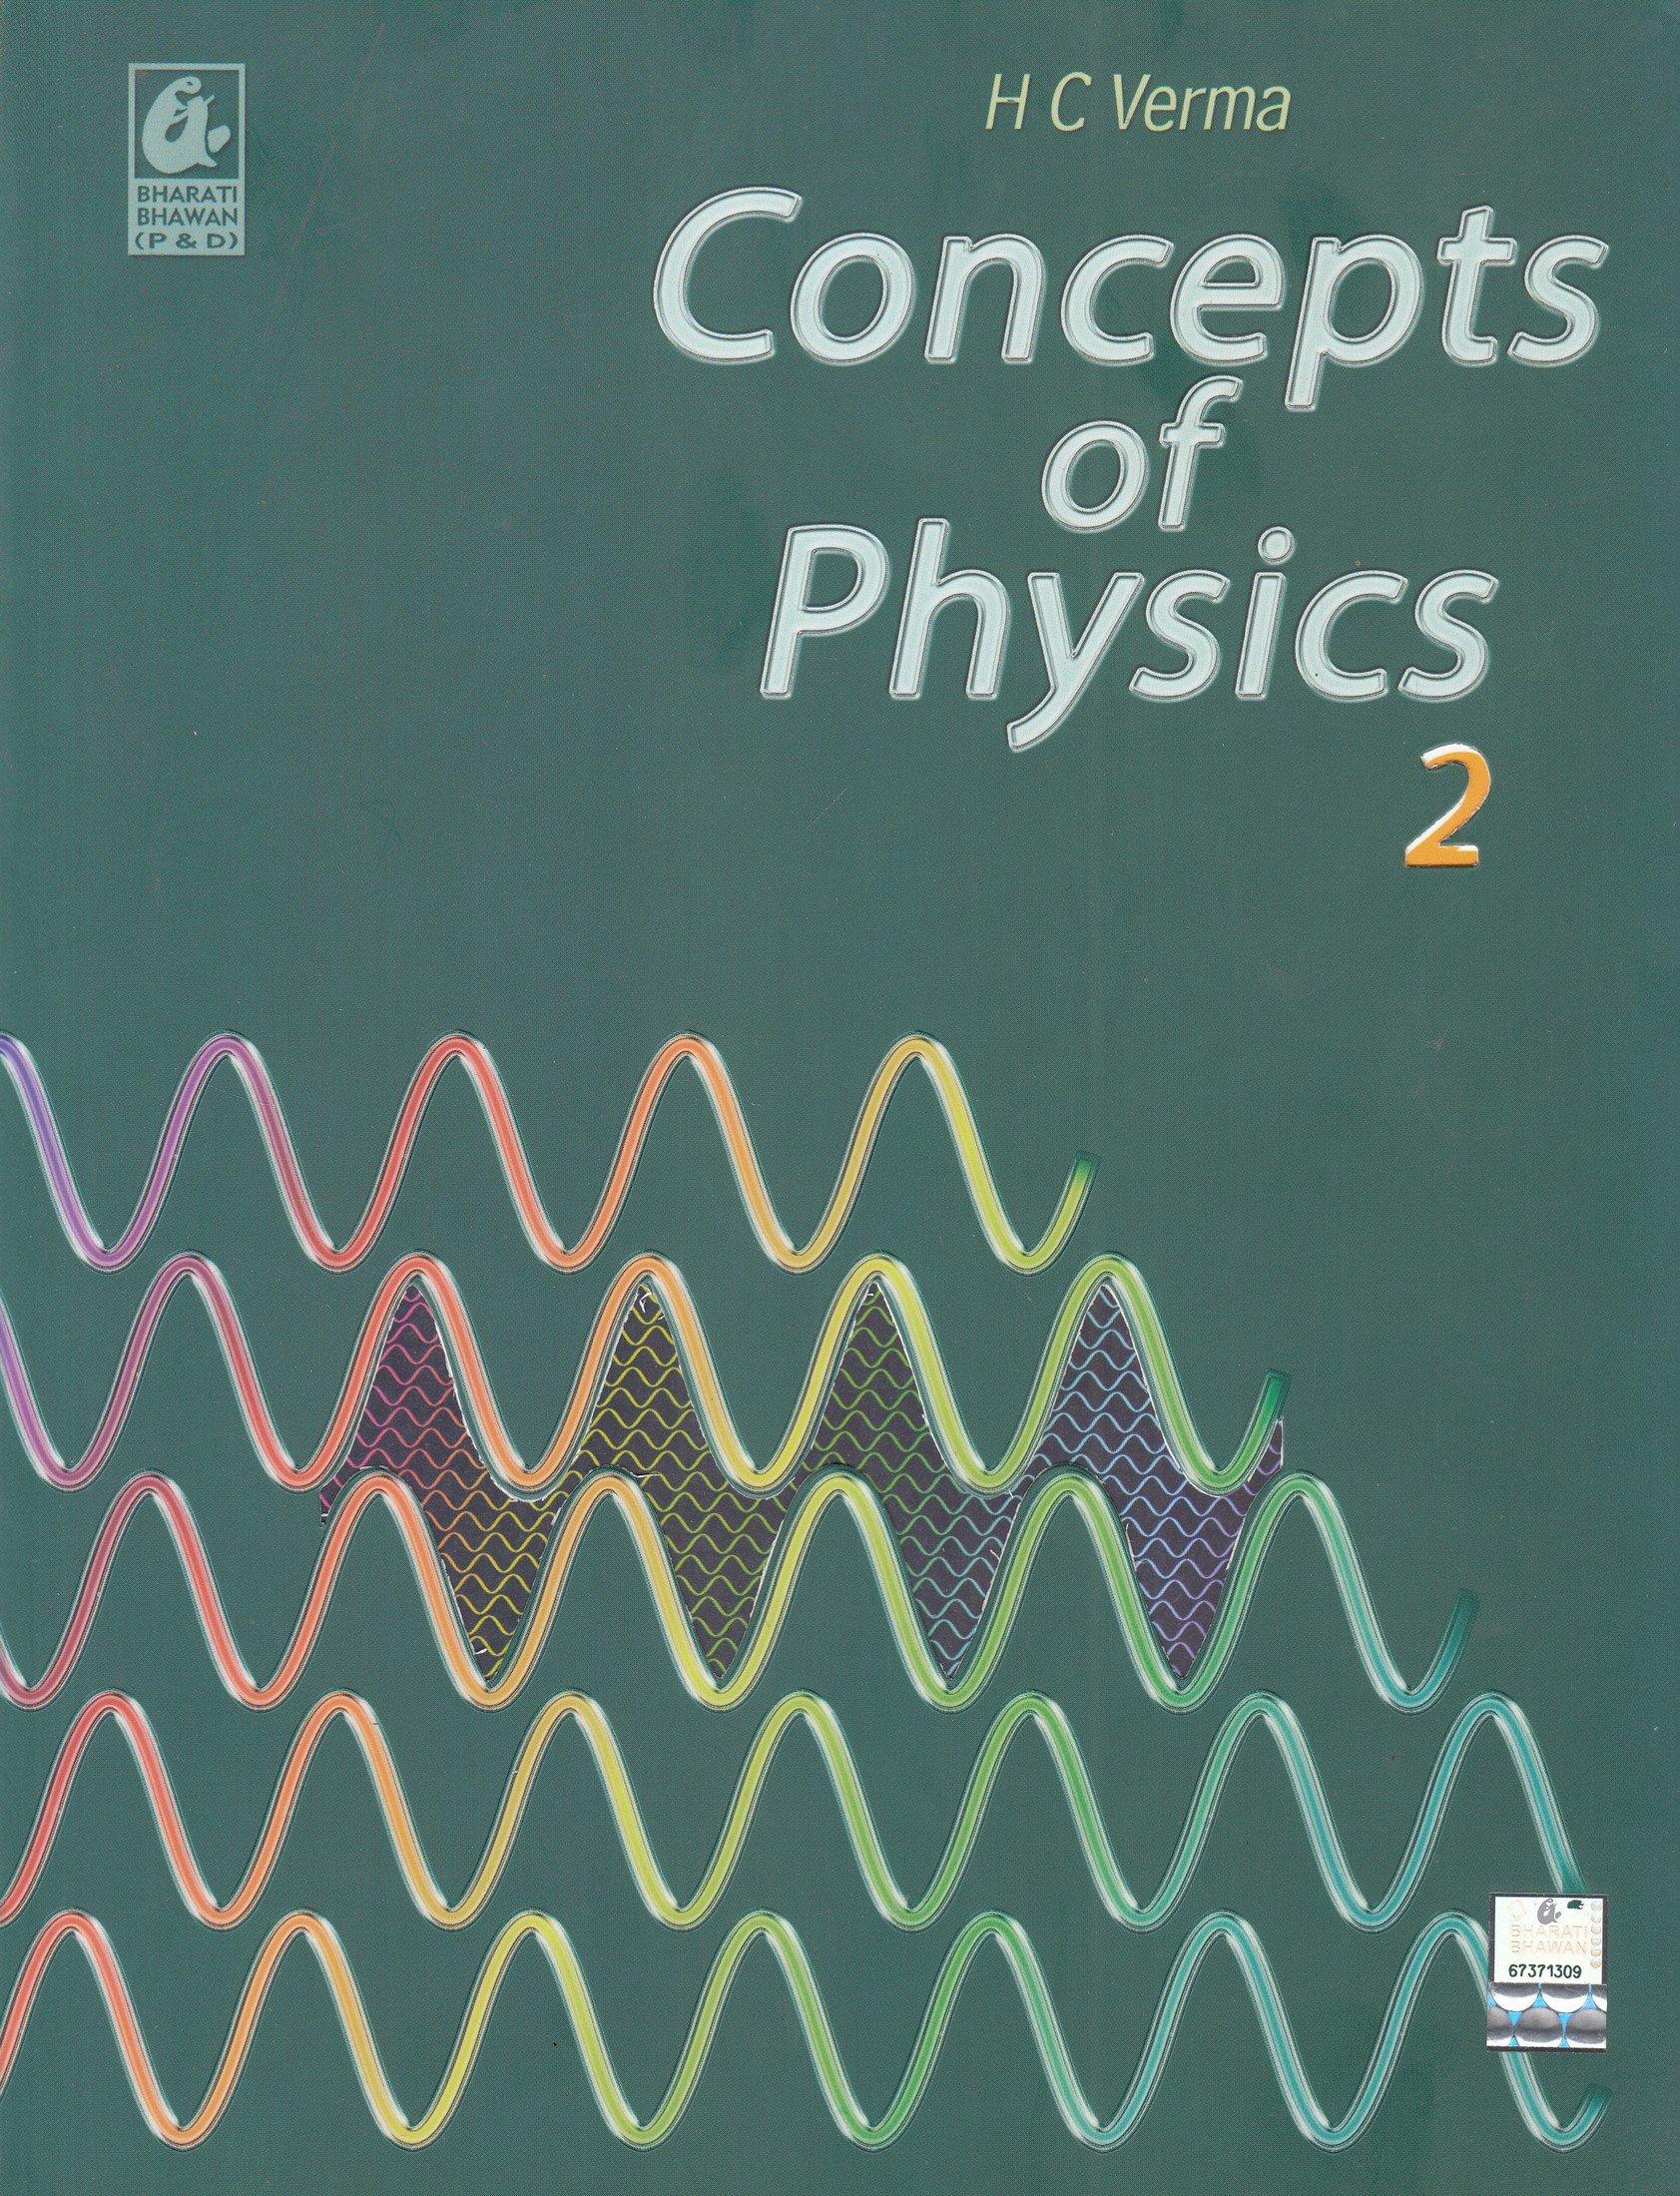 Concepts of physics 2 amazon hc verma books malvernweather Choice Image